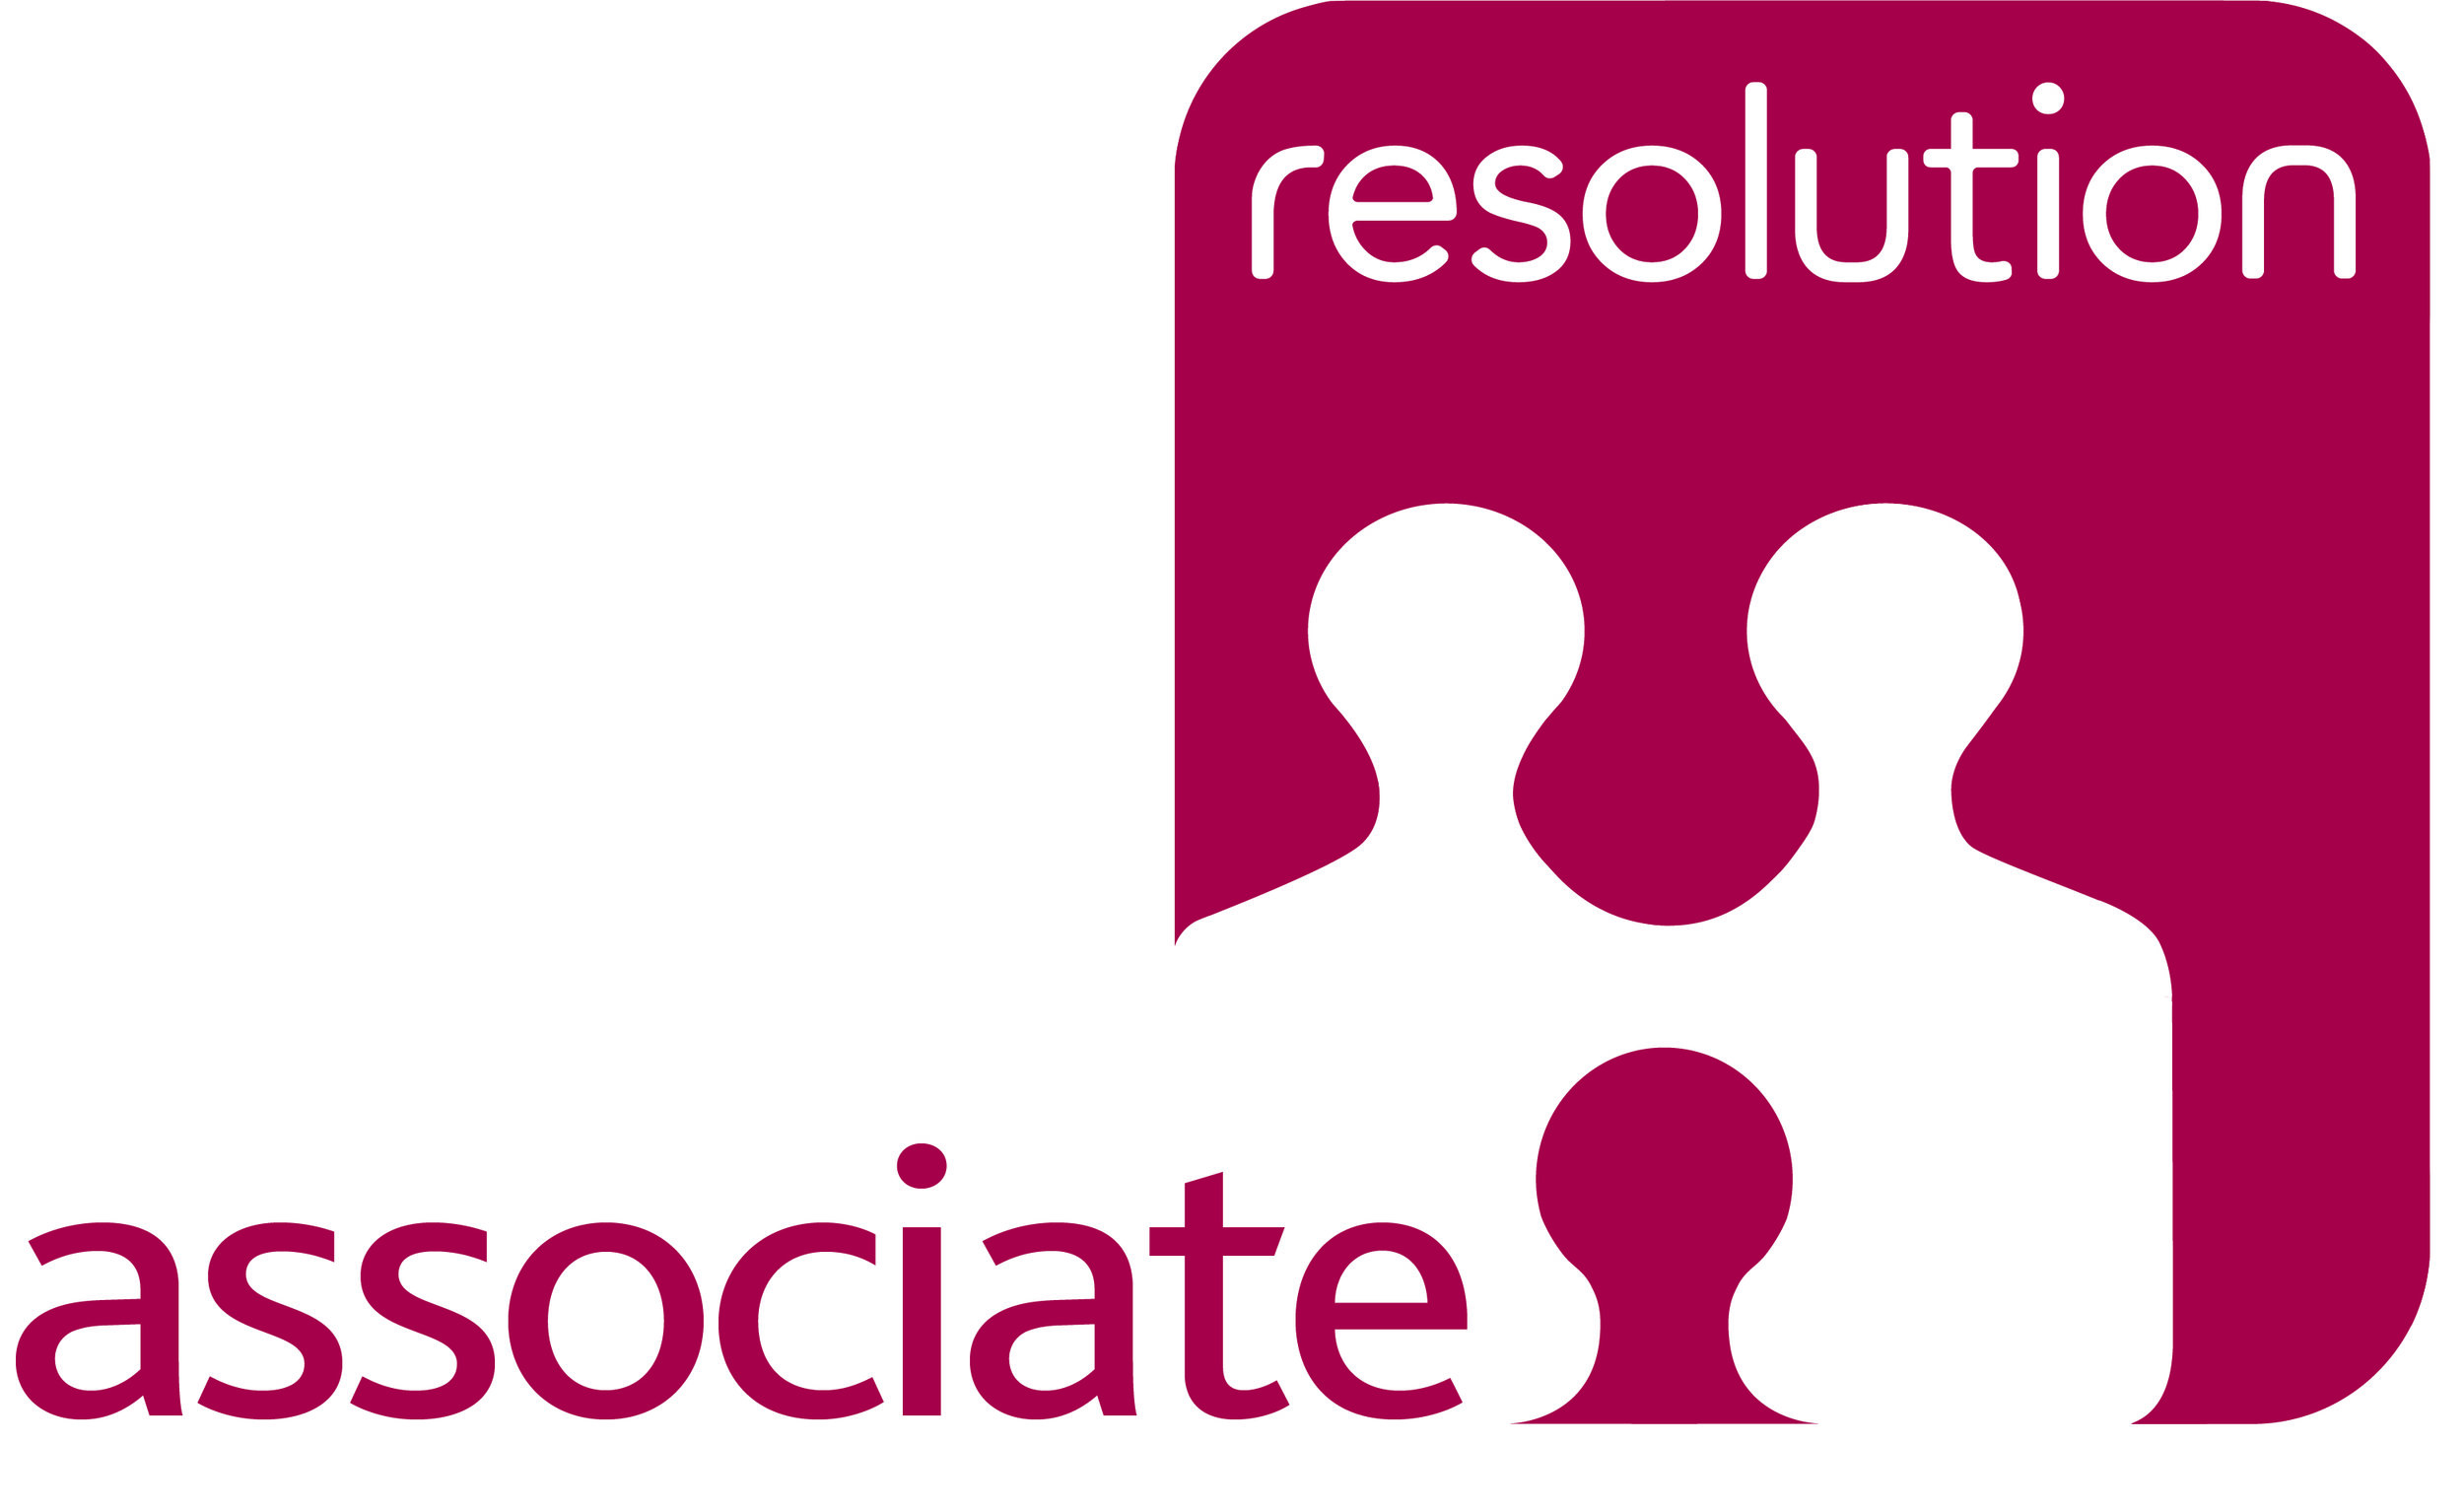 Associate logo CMYK.jpg